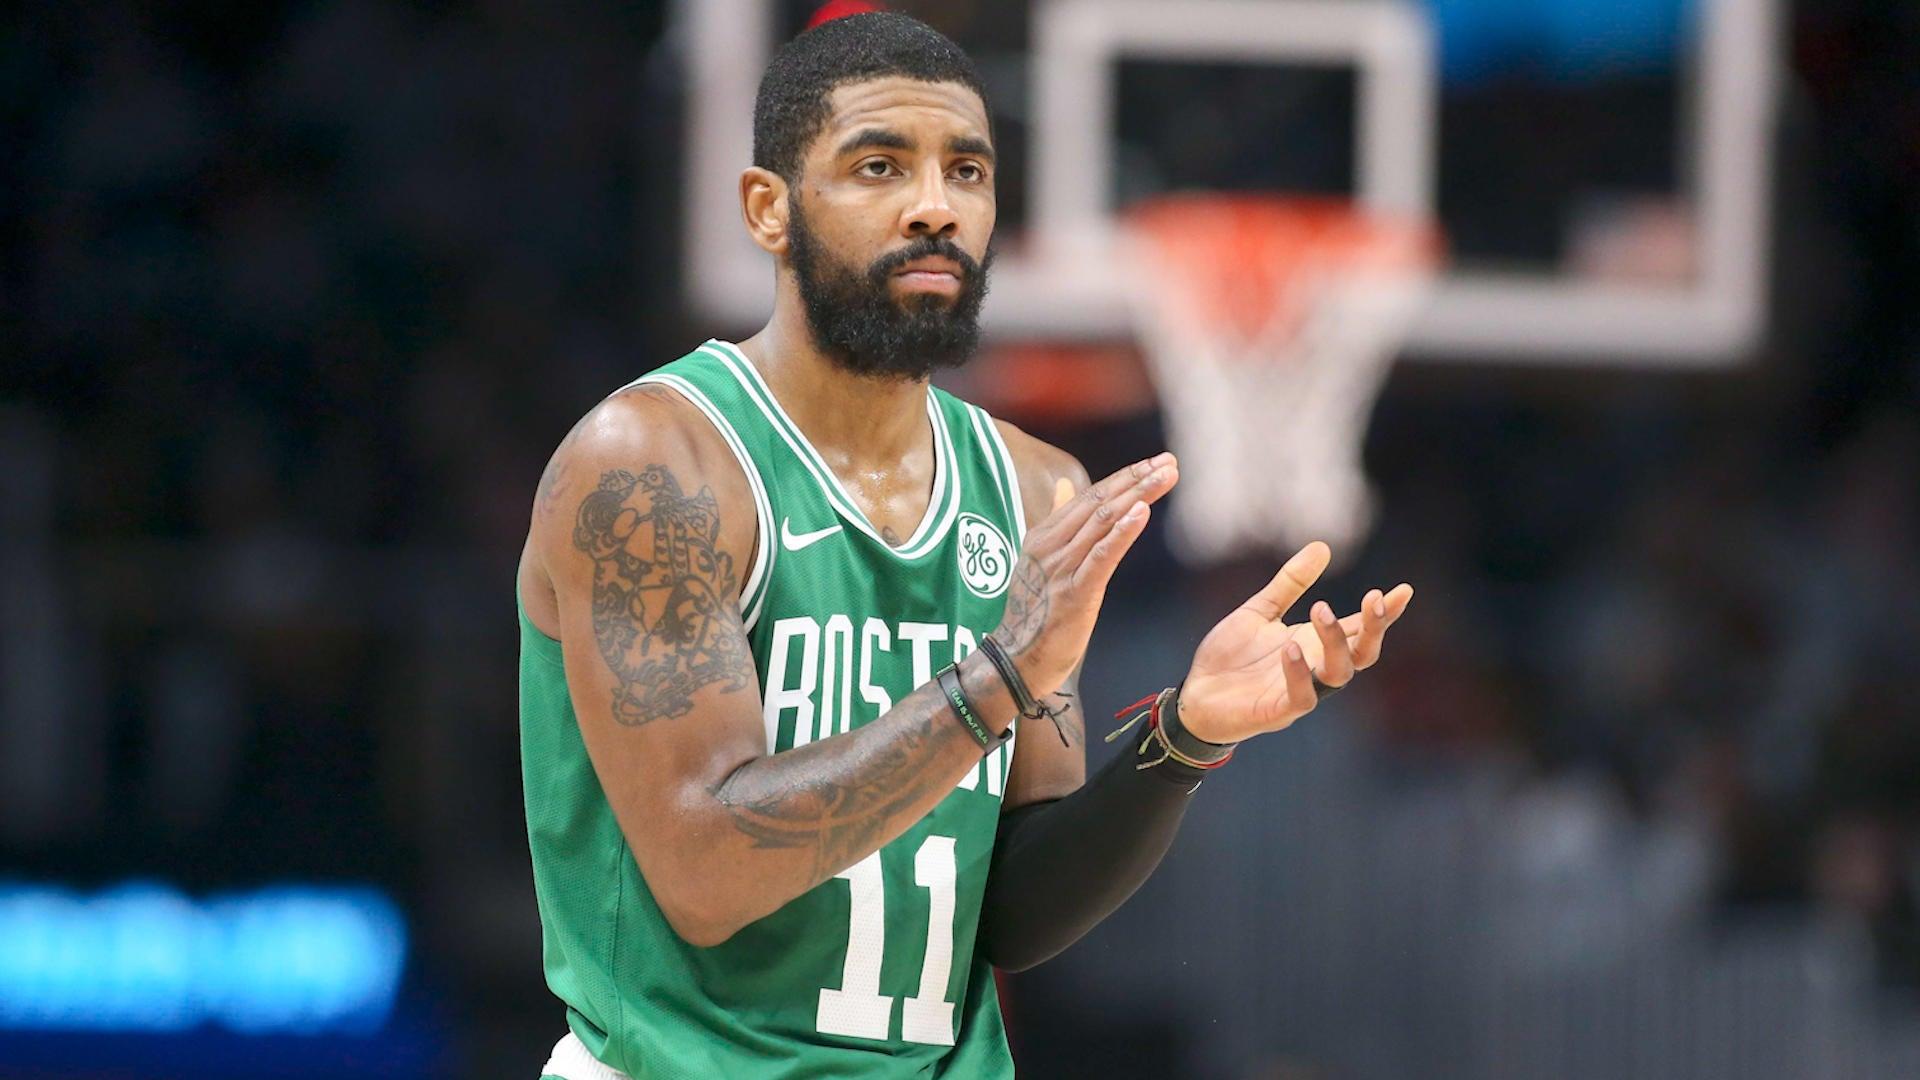 Celtics vs. Bucks: Watch NBA online, live stream, TV channel, time, odds, picks, analysis